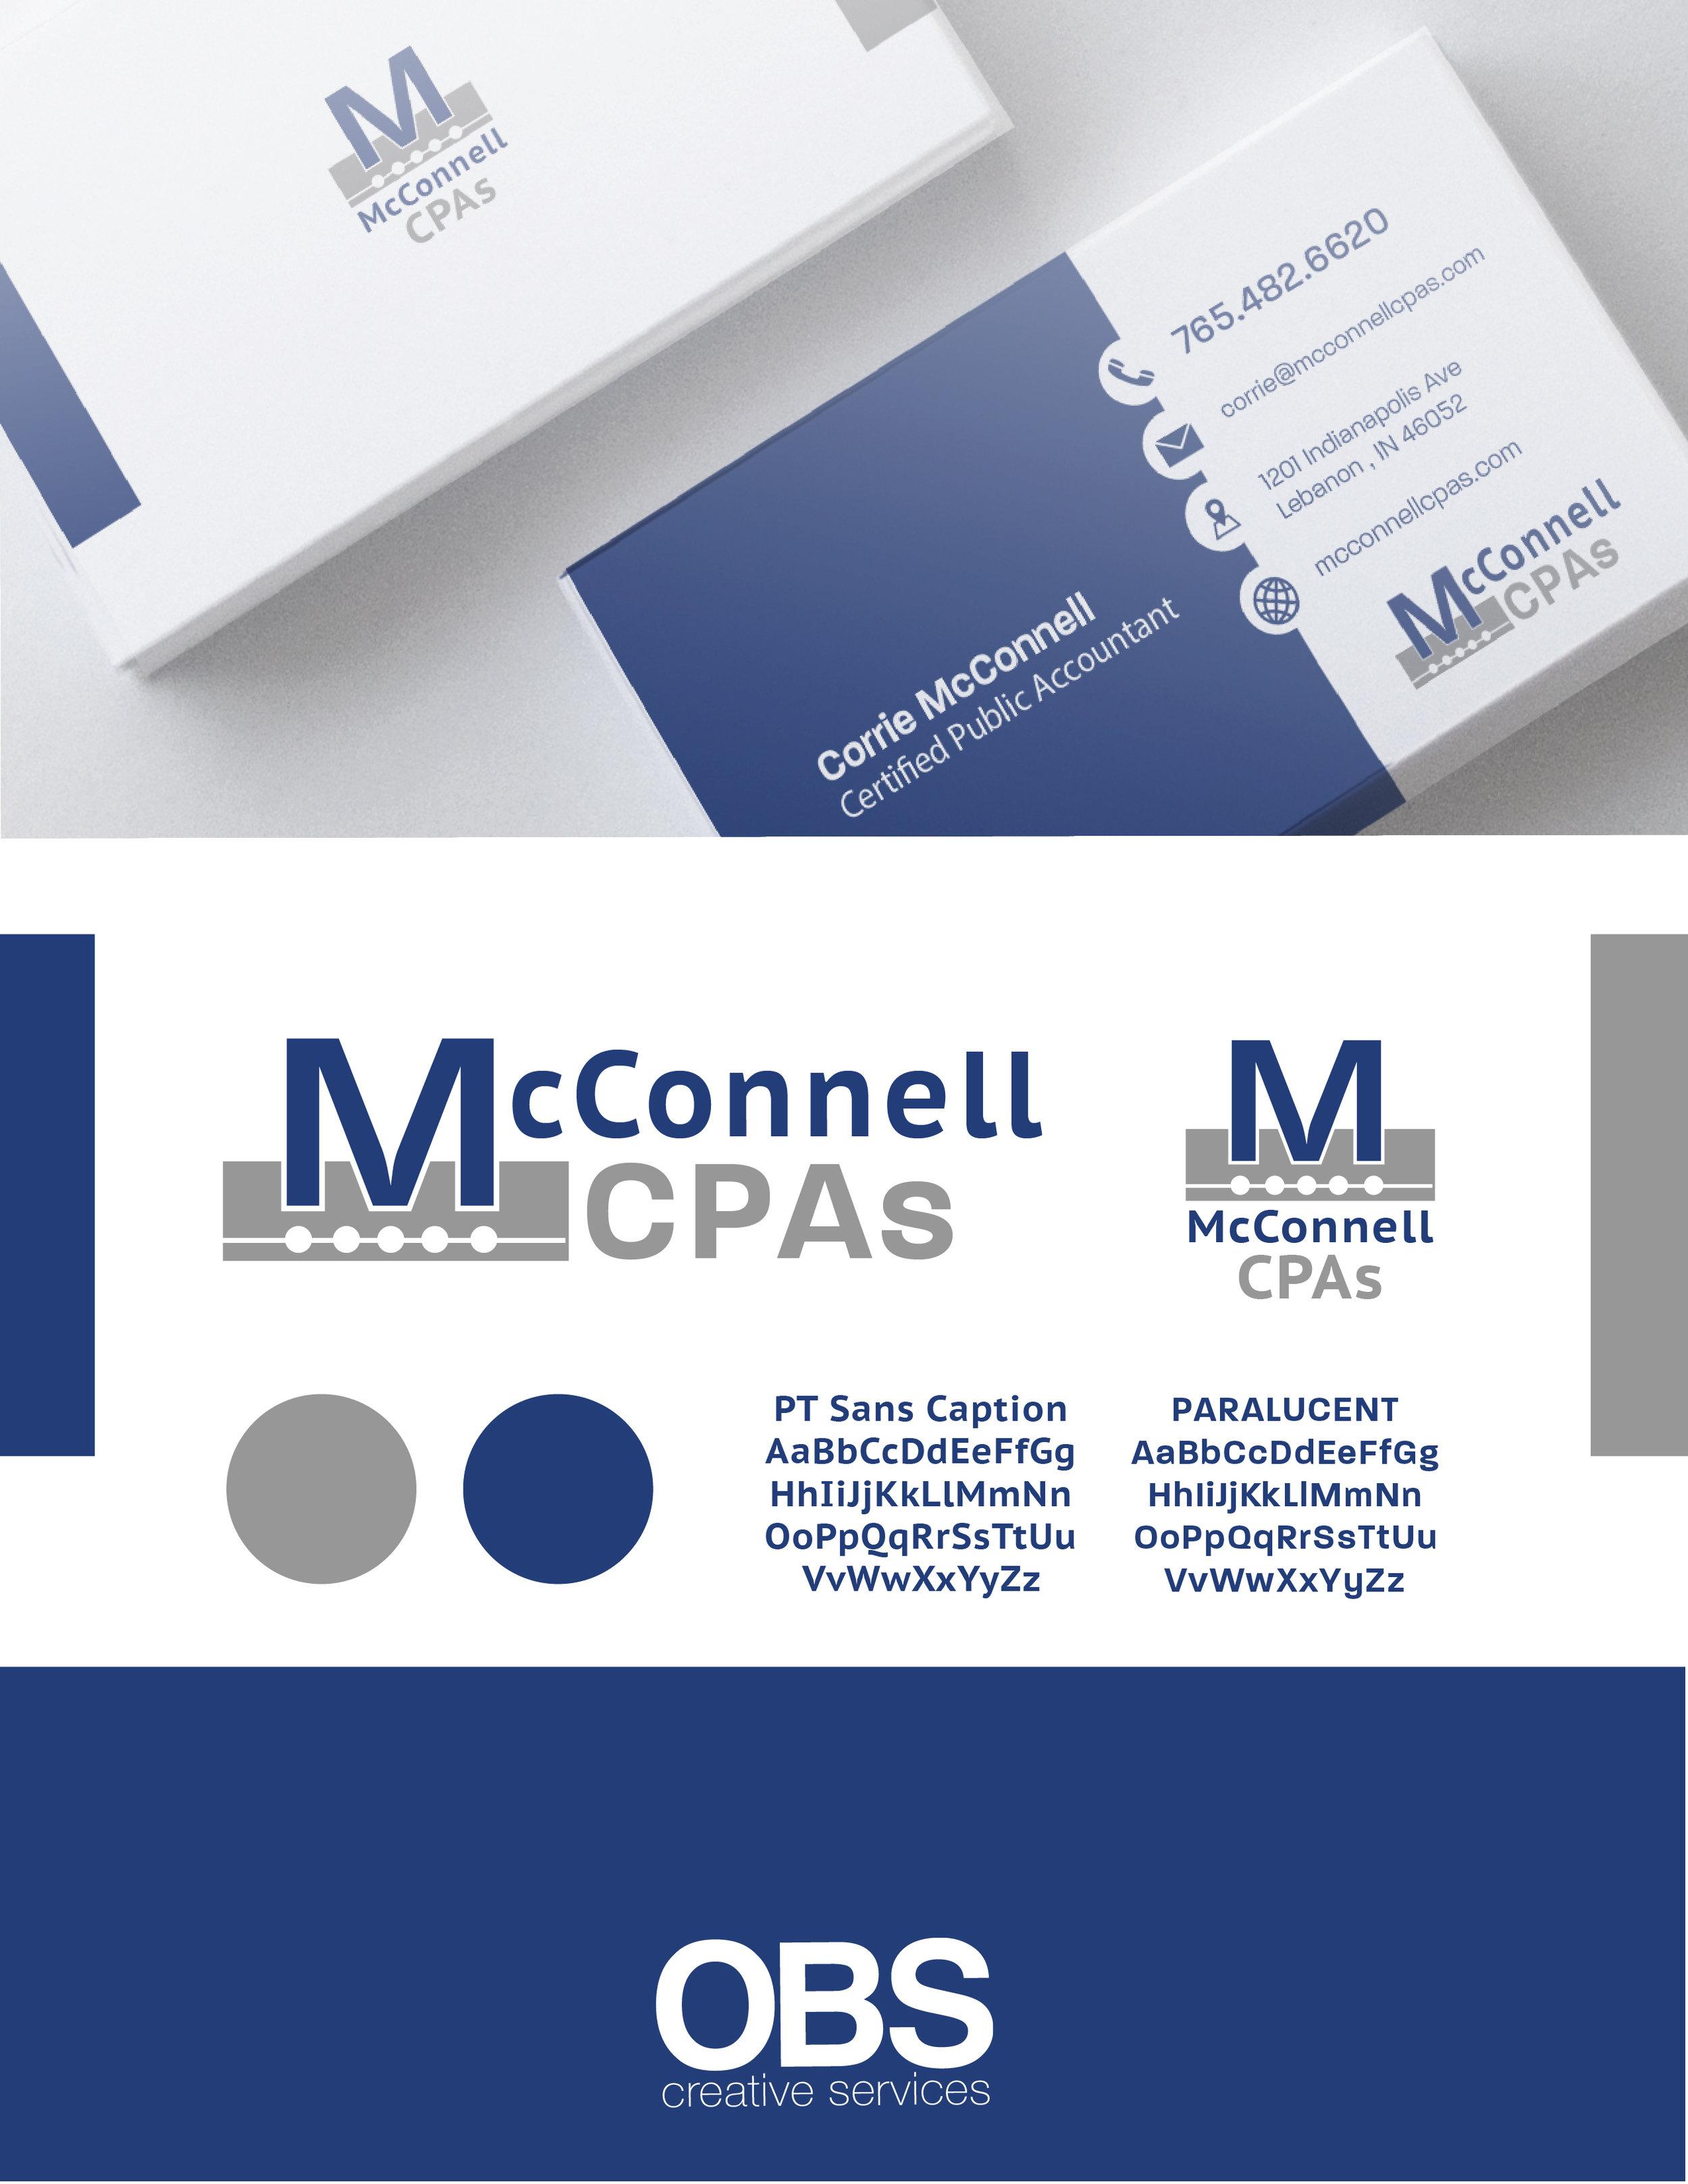 McConnell CPAs.jpg